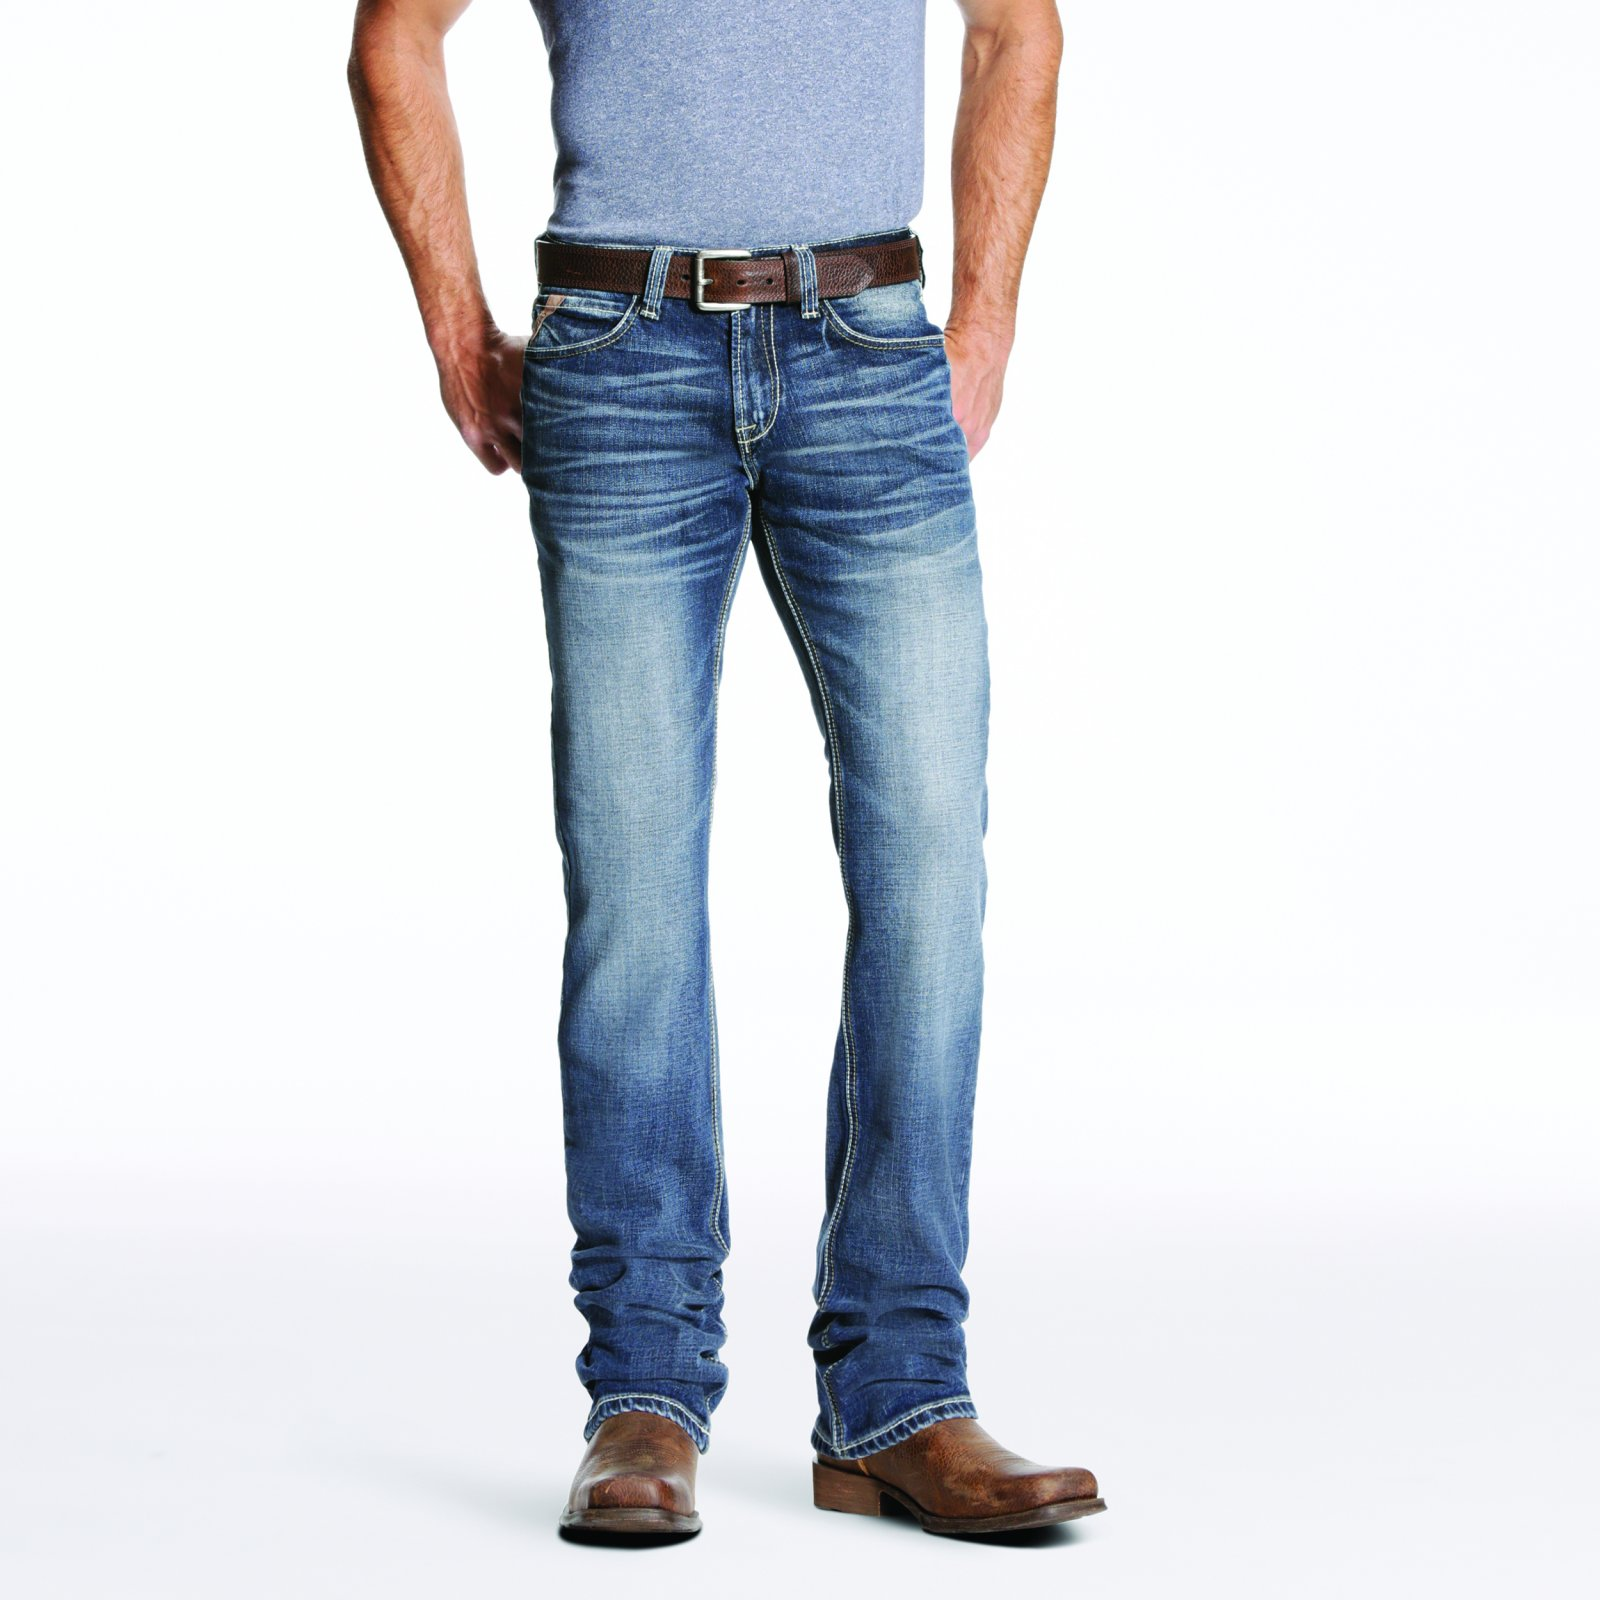 Men's M7 Angler Silverton Jean from Ariat